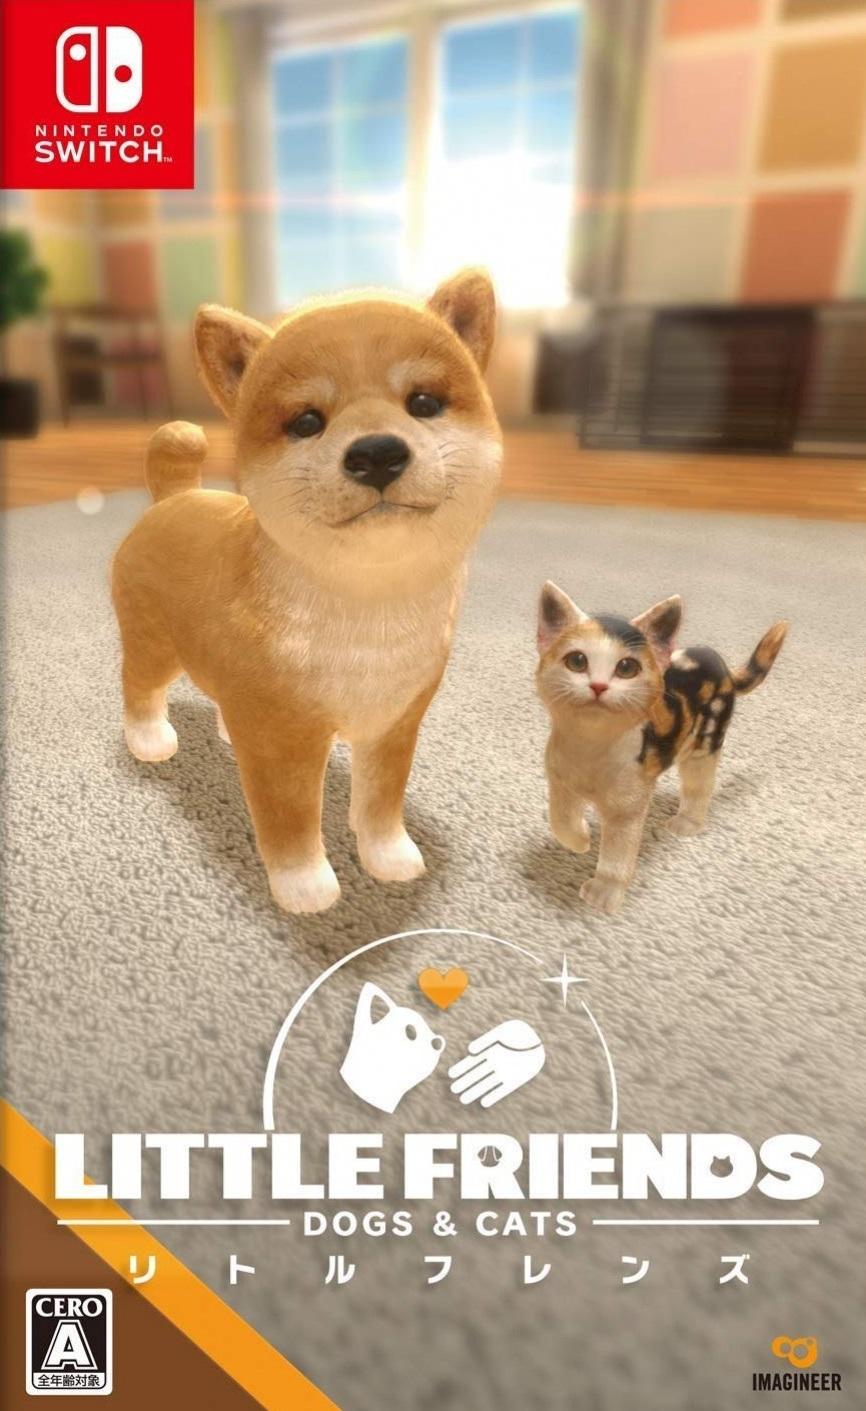 little-friends-dogs-cats-multilanguage-586471.1.jpg